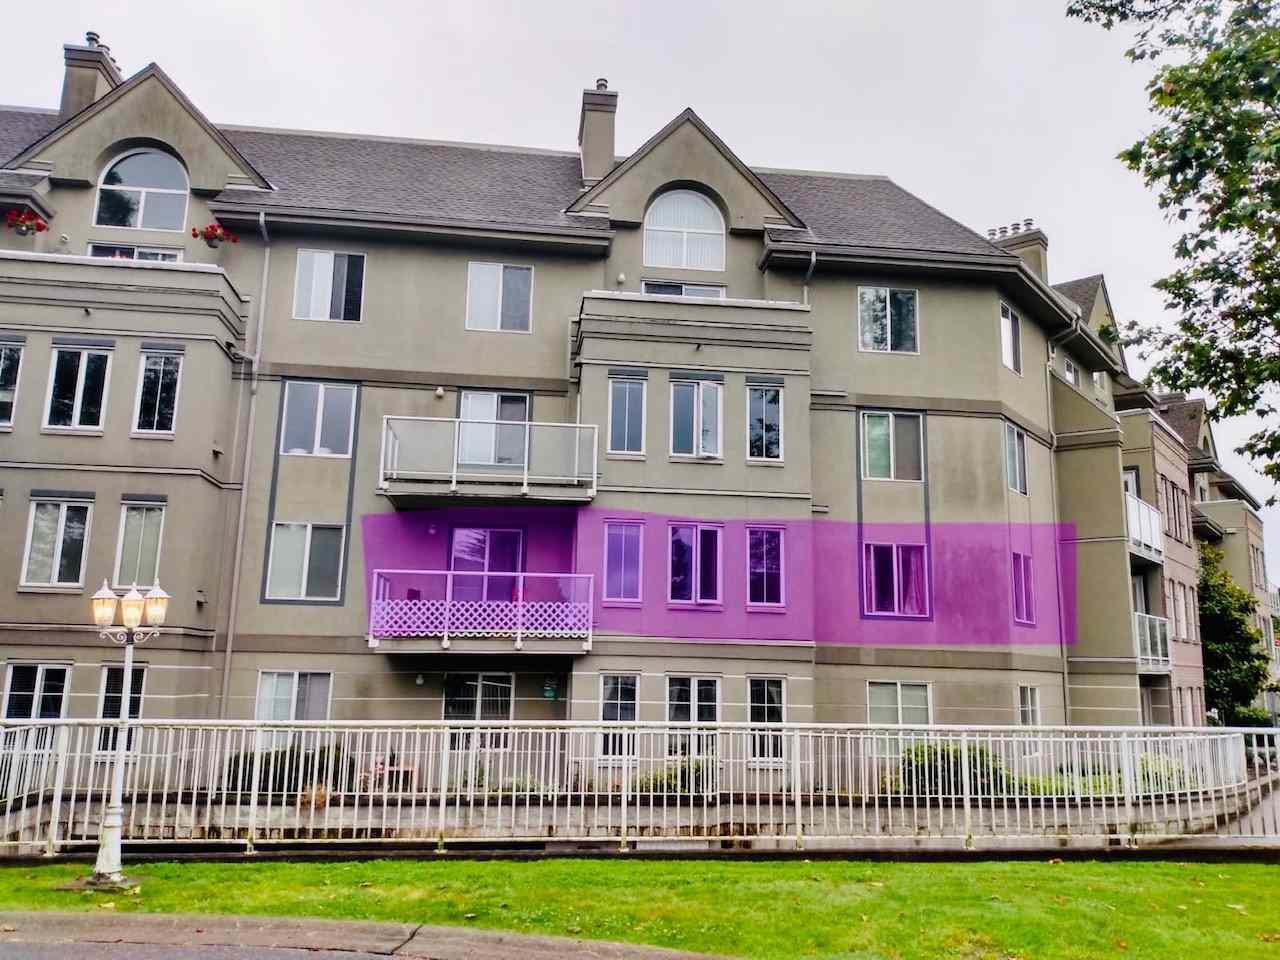 Main Photo: 202 12125 75A Avenue in Surrey: West Newton Condo for sale : MLS®# R2495584